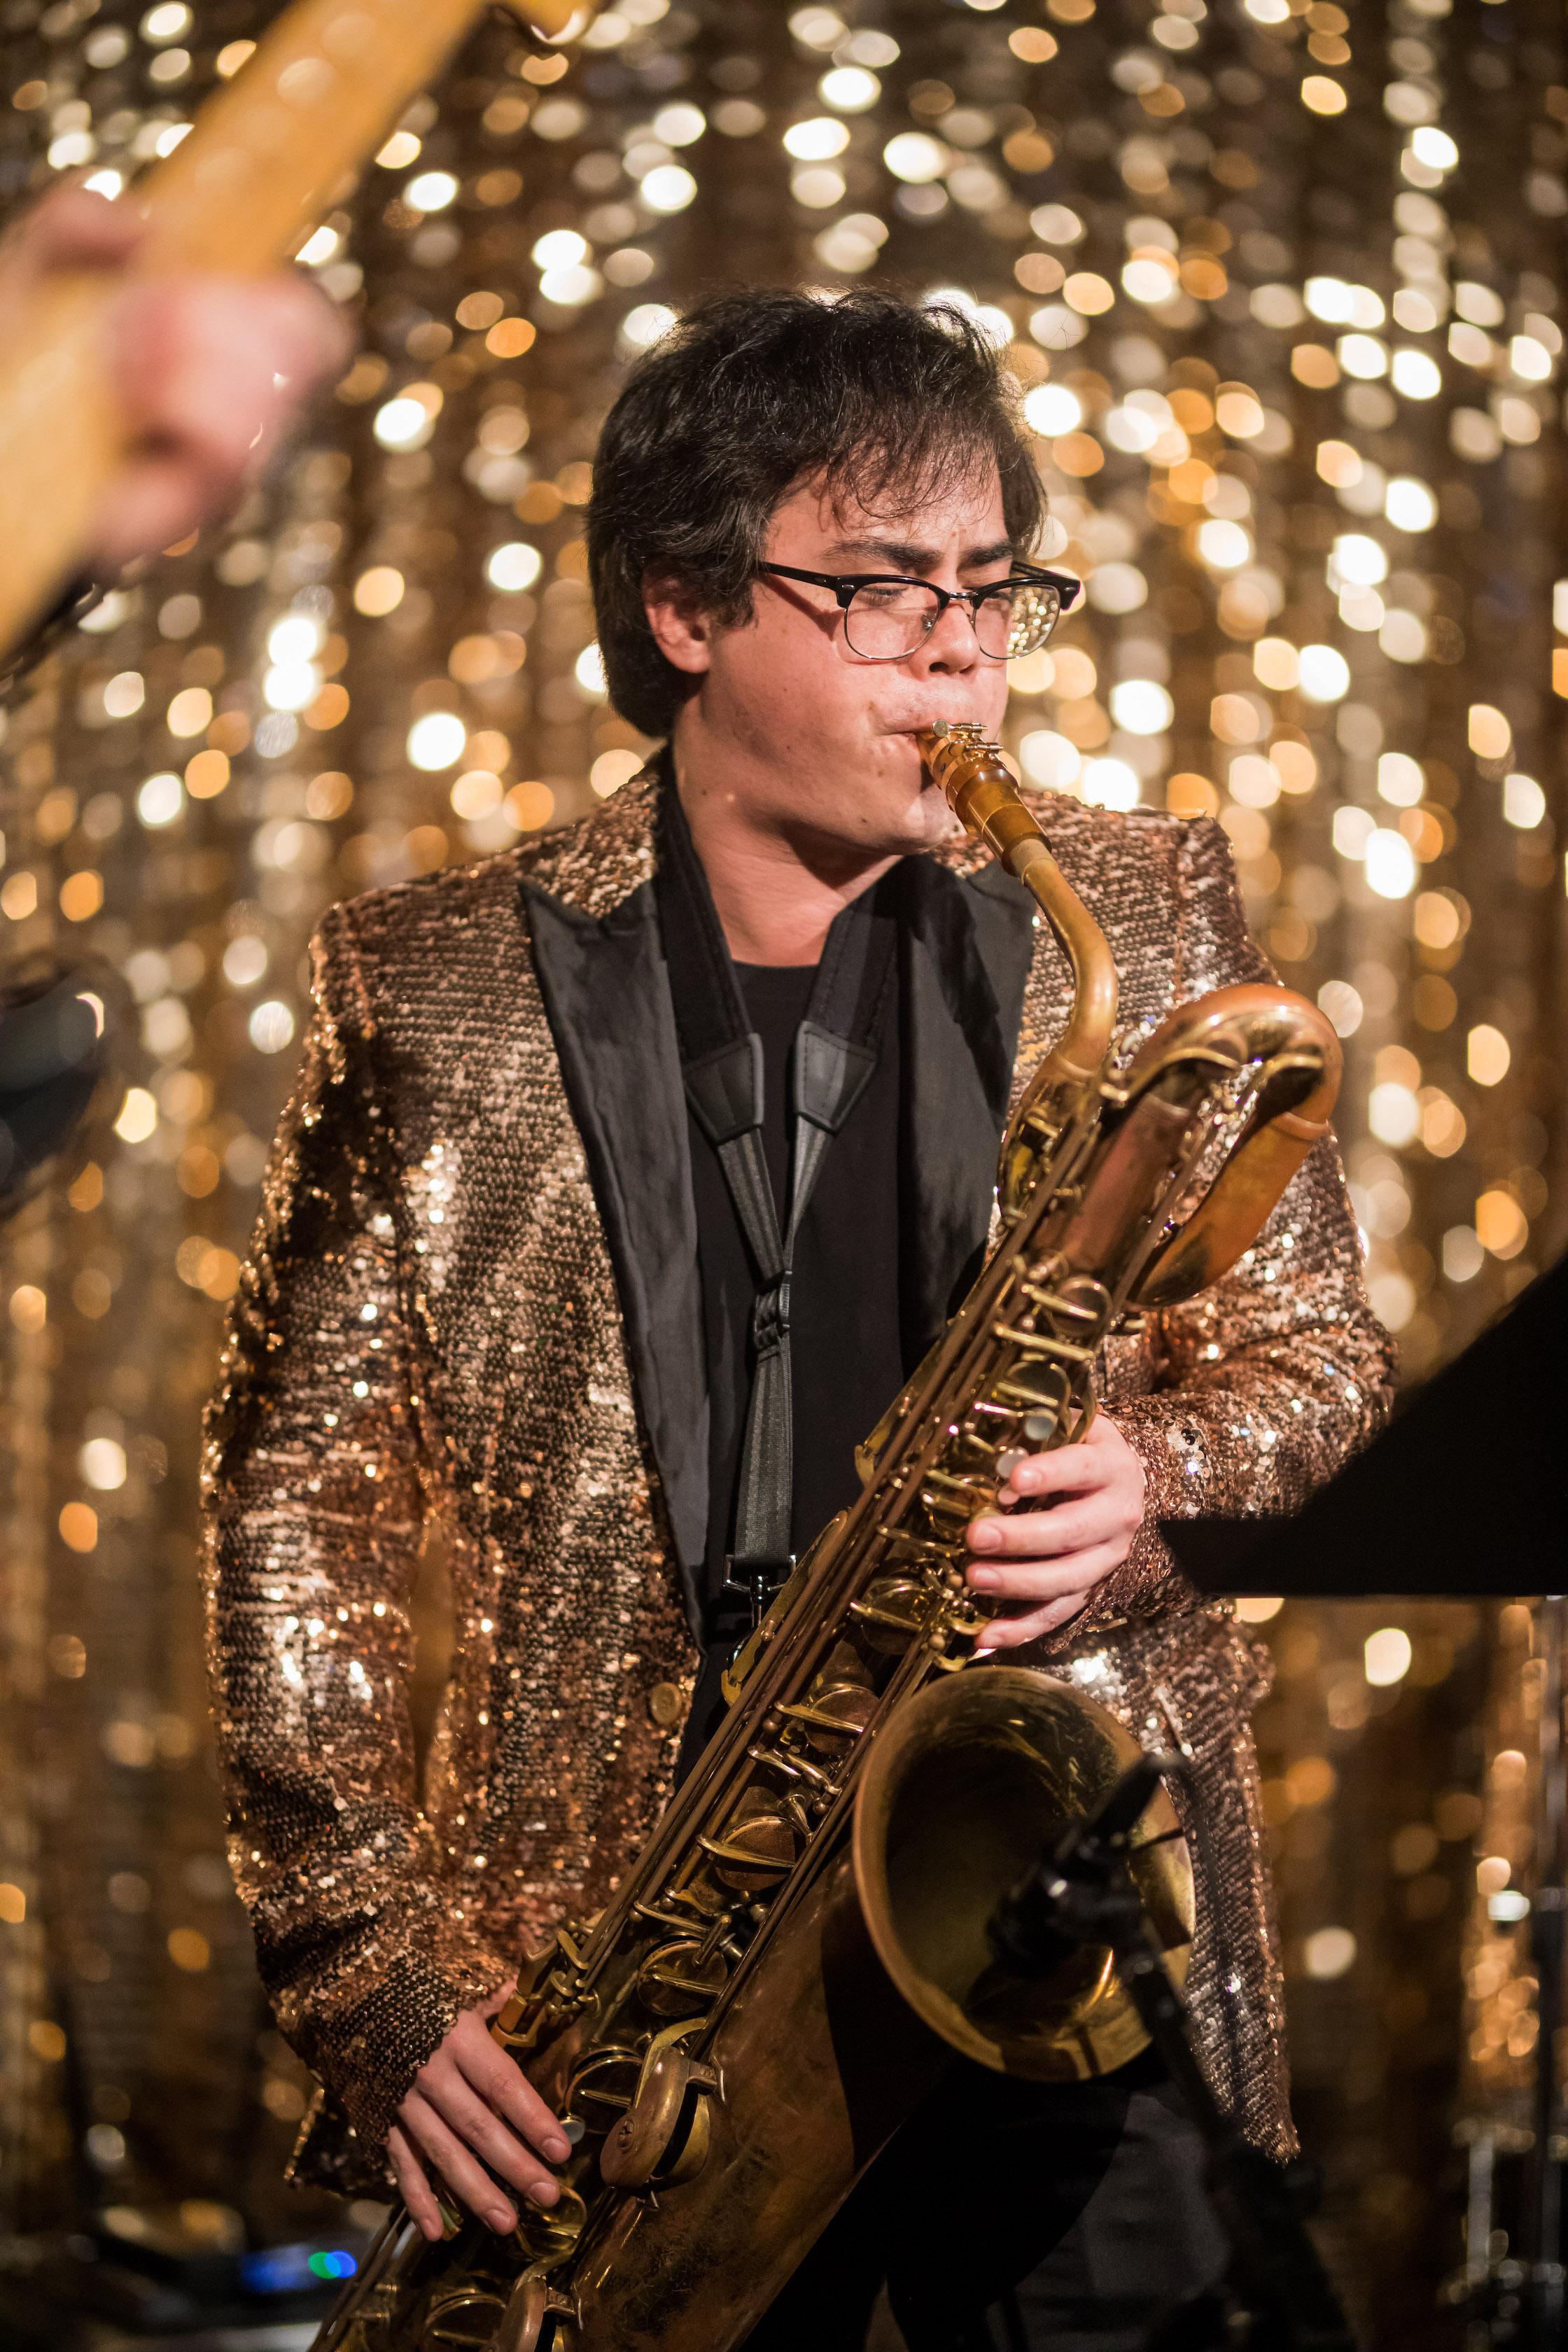 Max, clarinet -